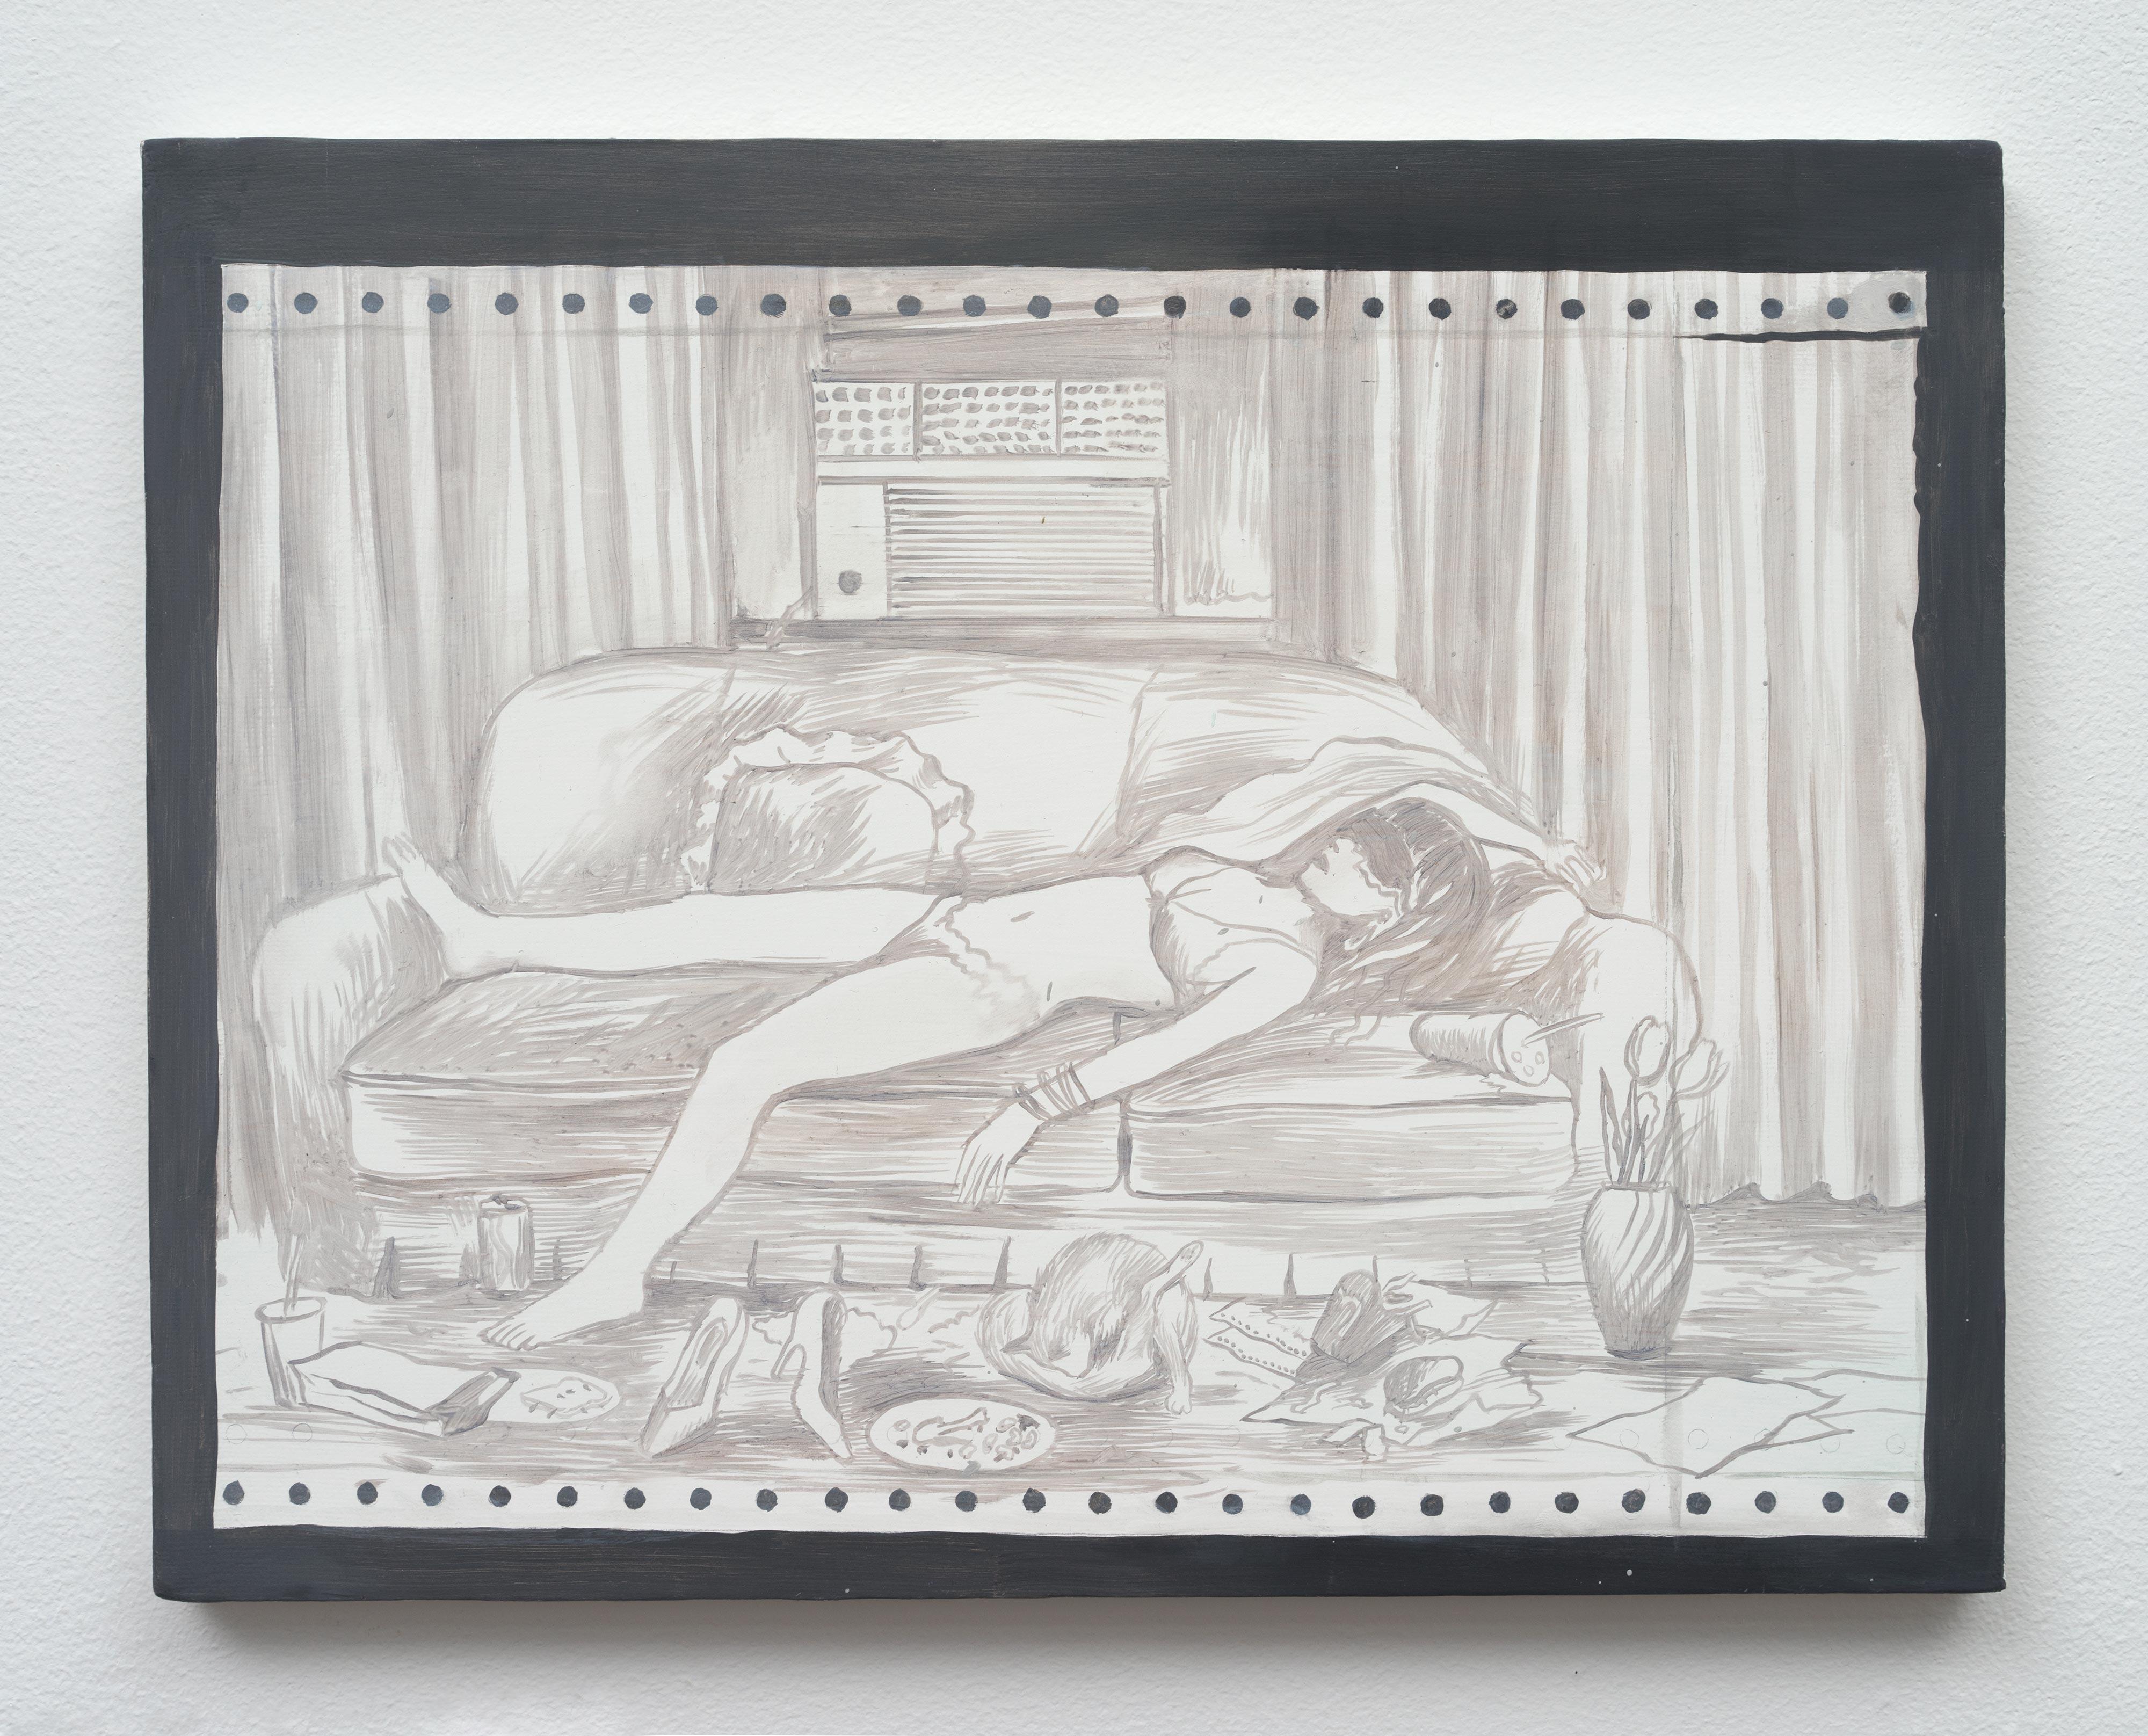 Brandi Twilley<br>By the AC<br>2014<br>oil on canvas<br>11 x 14 in (27.94 x 35.56 cm)